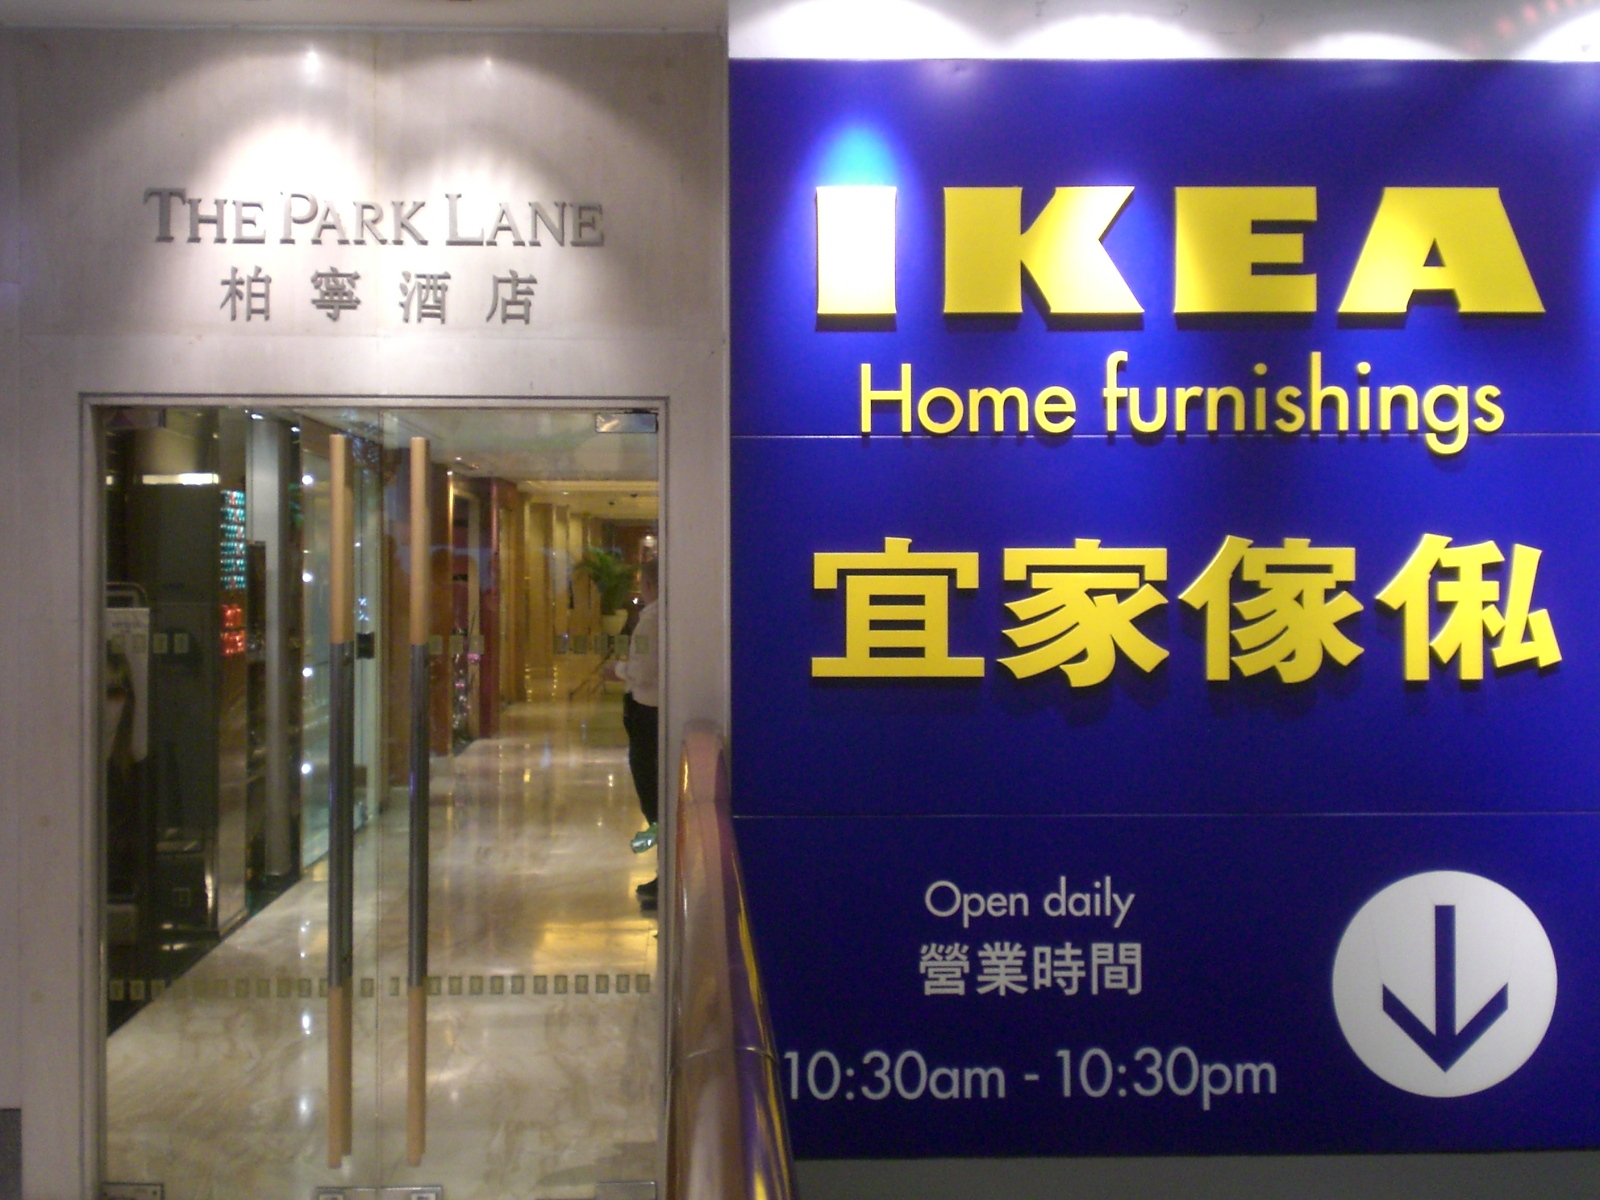 Filehk Cwb The Park Lane Hong Kong Hotel N Ikea Home Furnishings